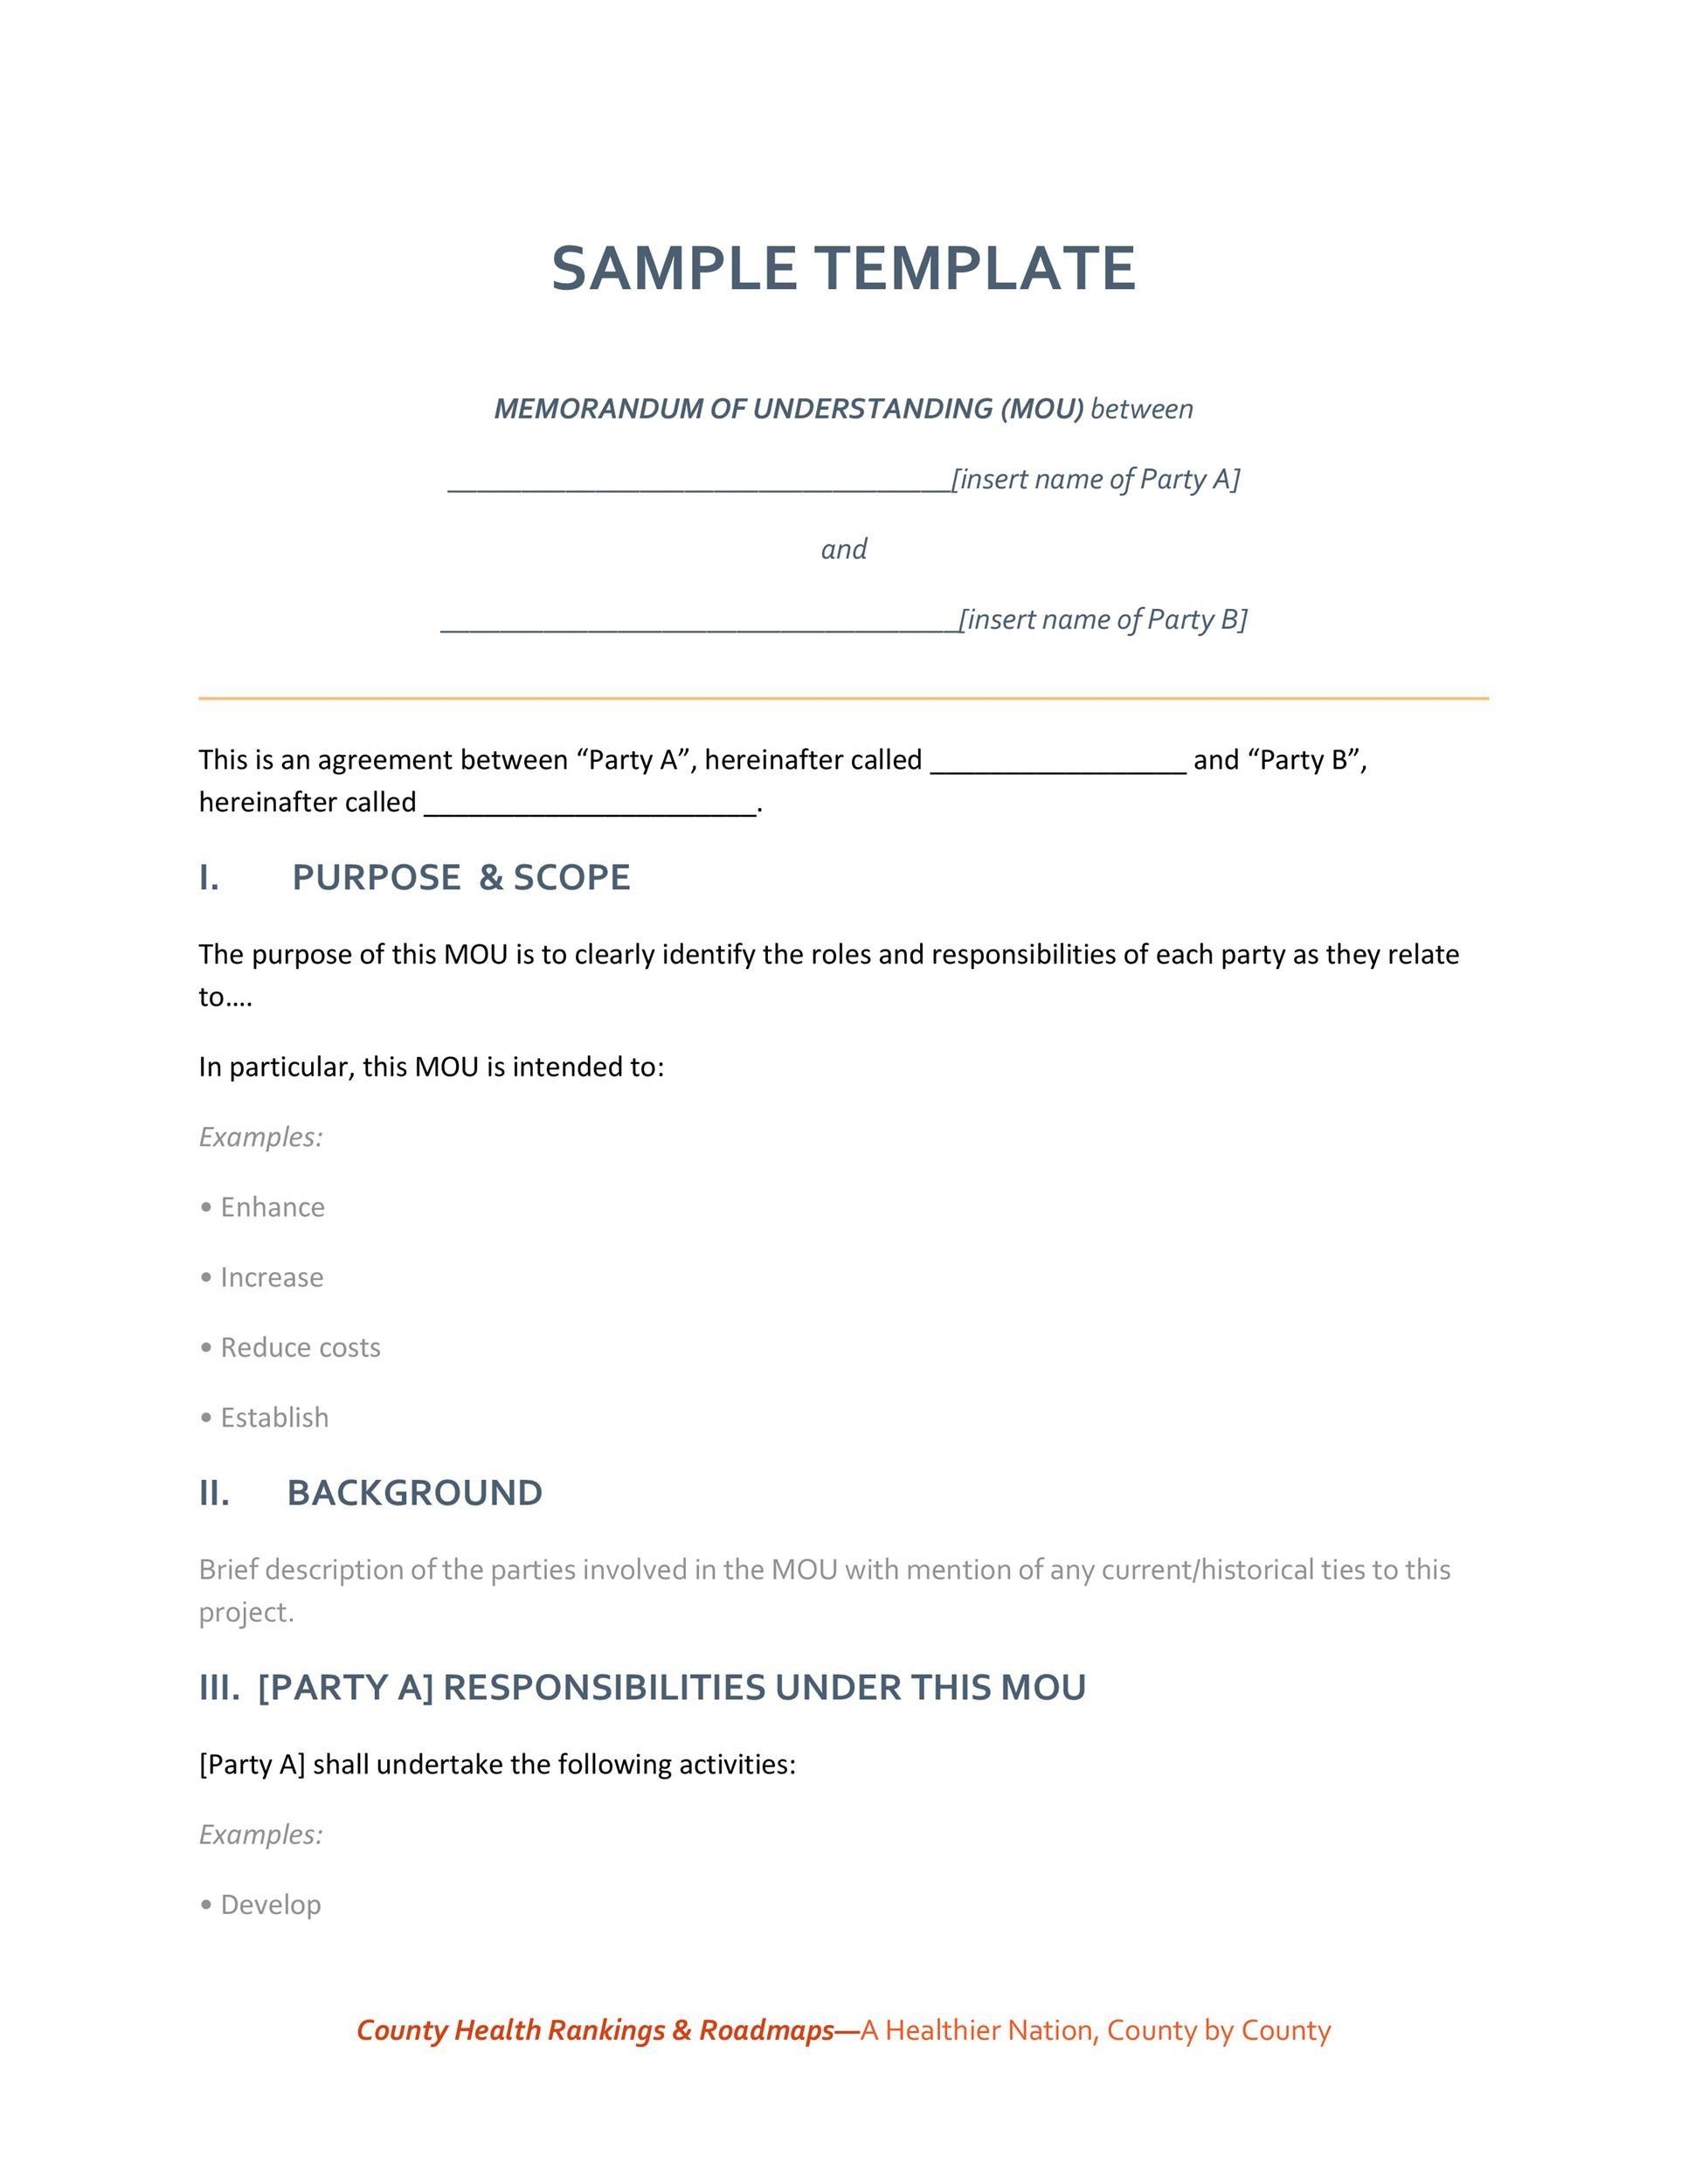 Free Memorandum of Understanding Template 01